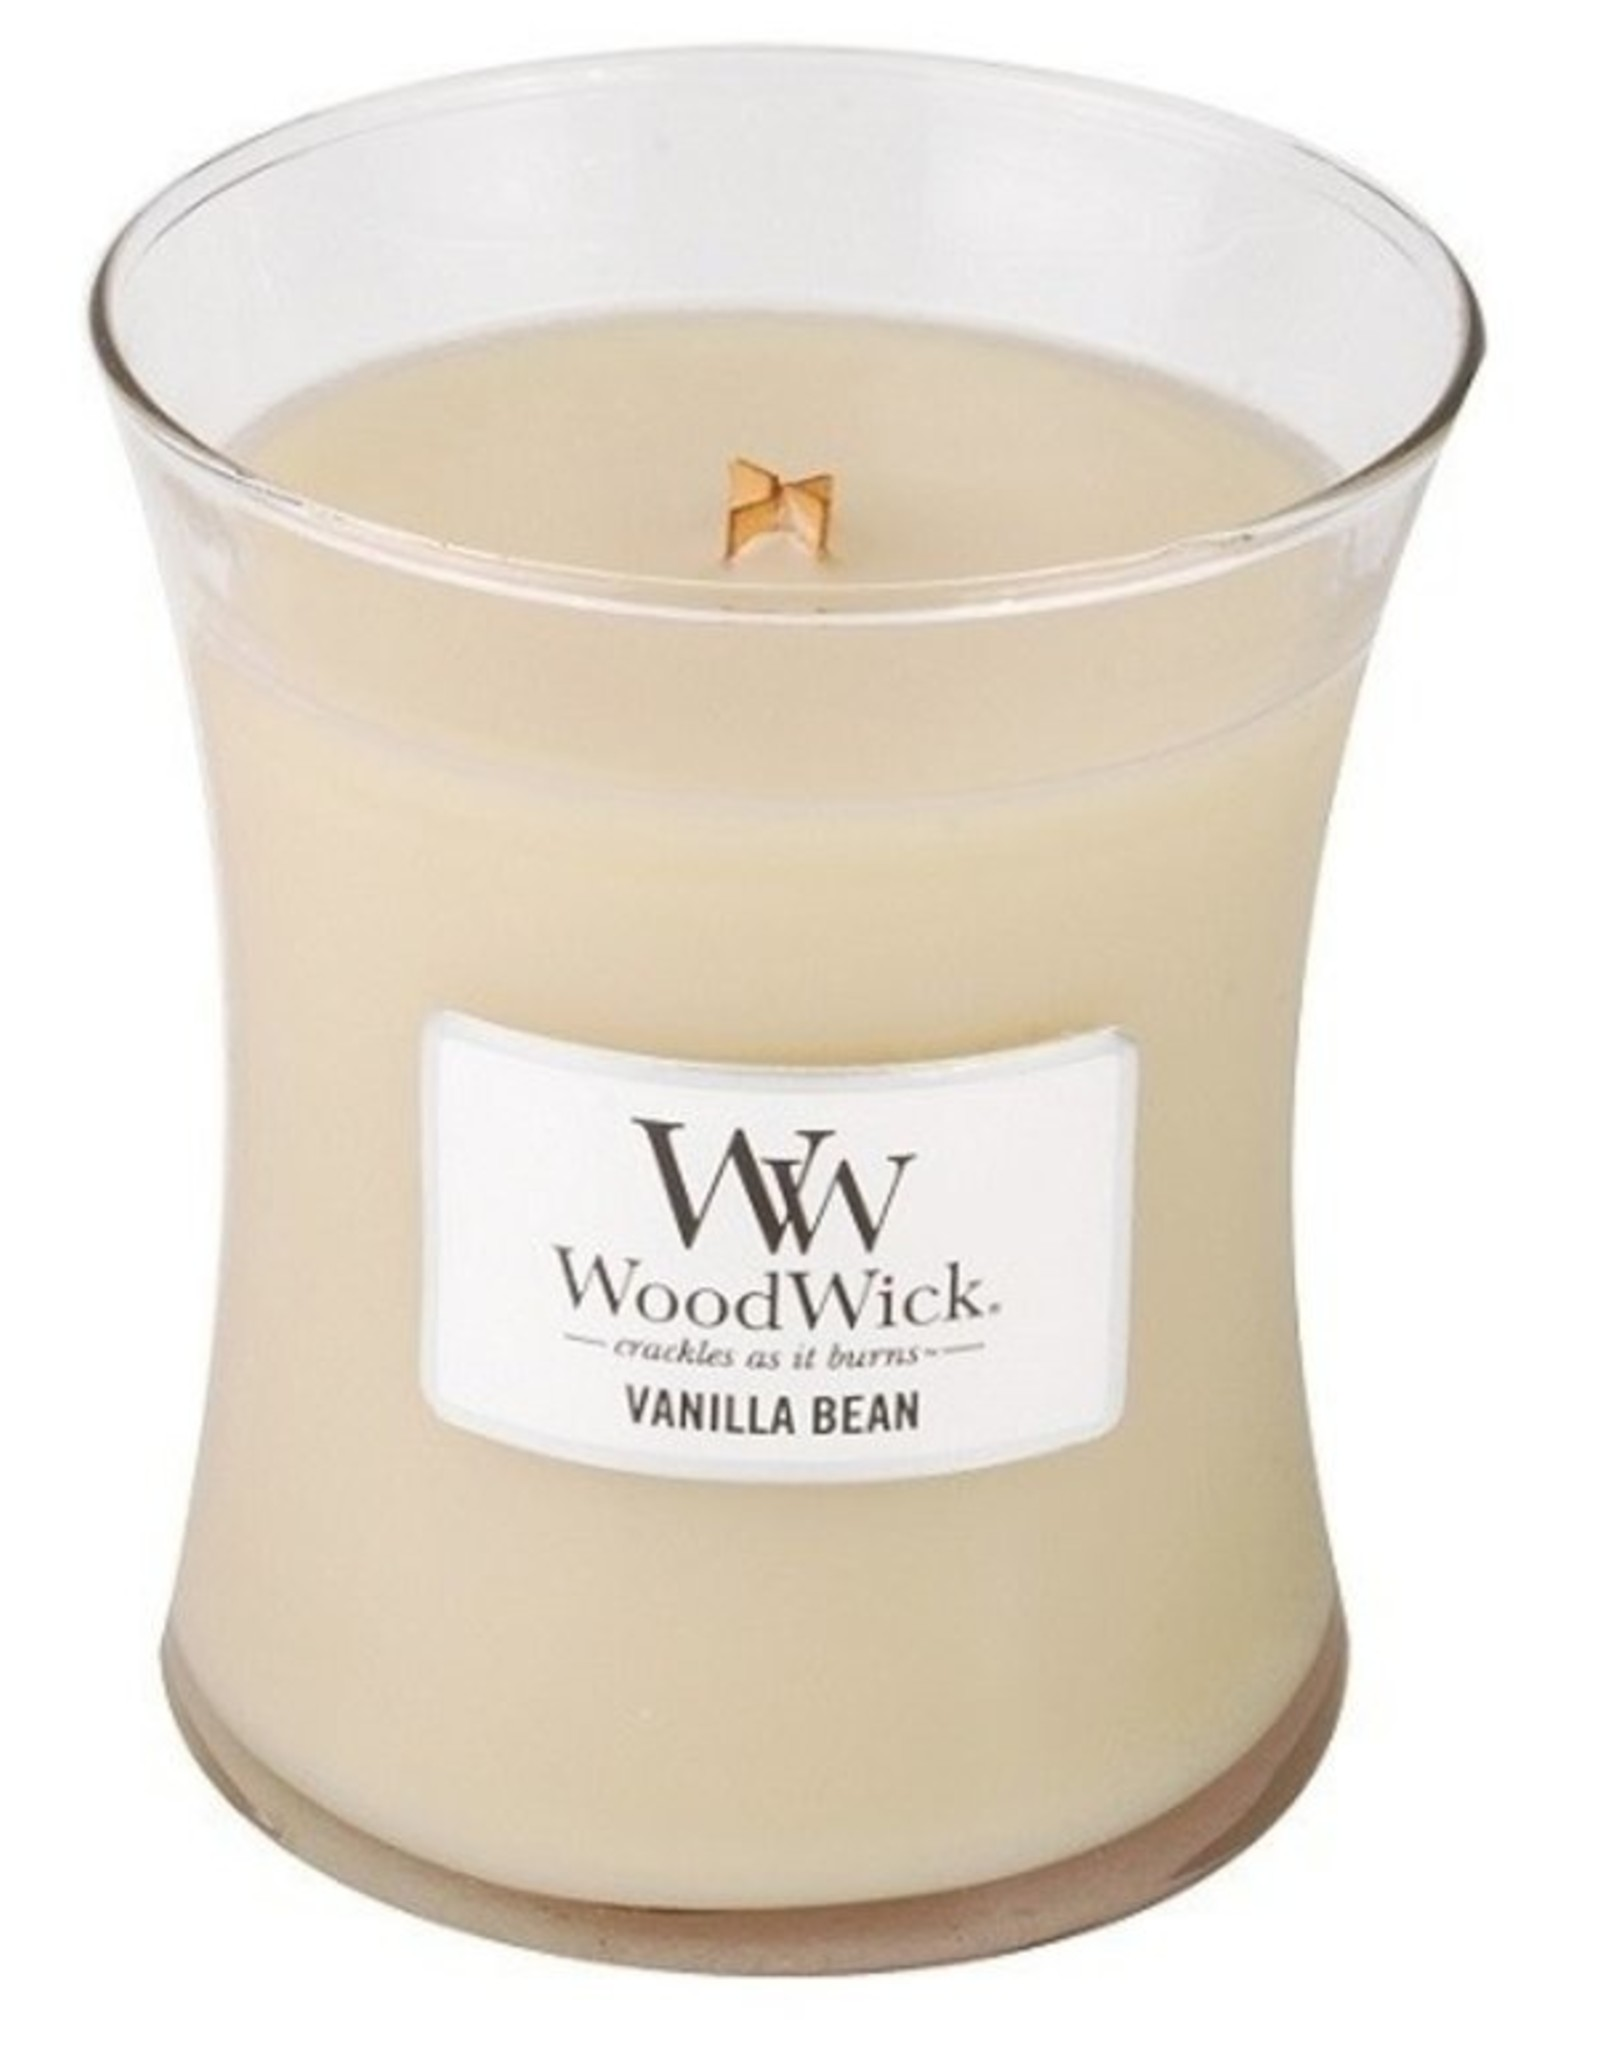 Woodwick Woodwick Vanilla Bean Medium Candle